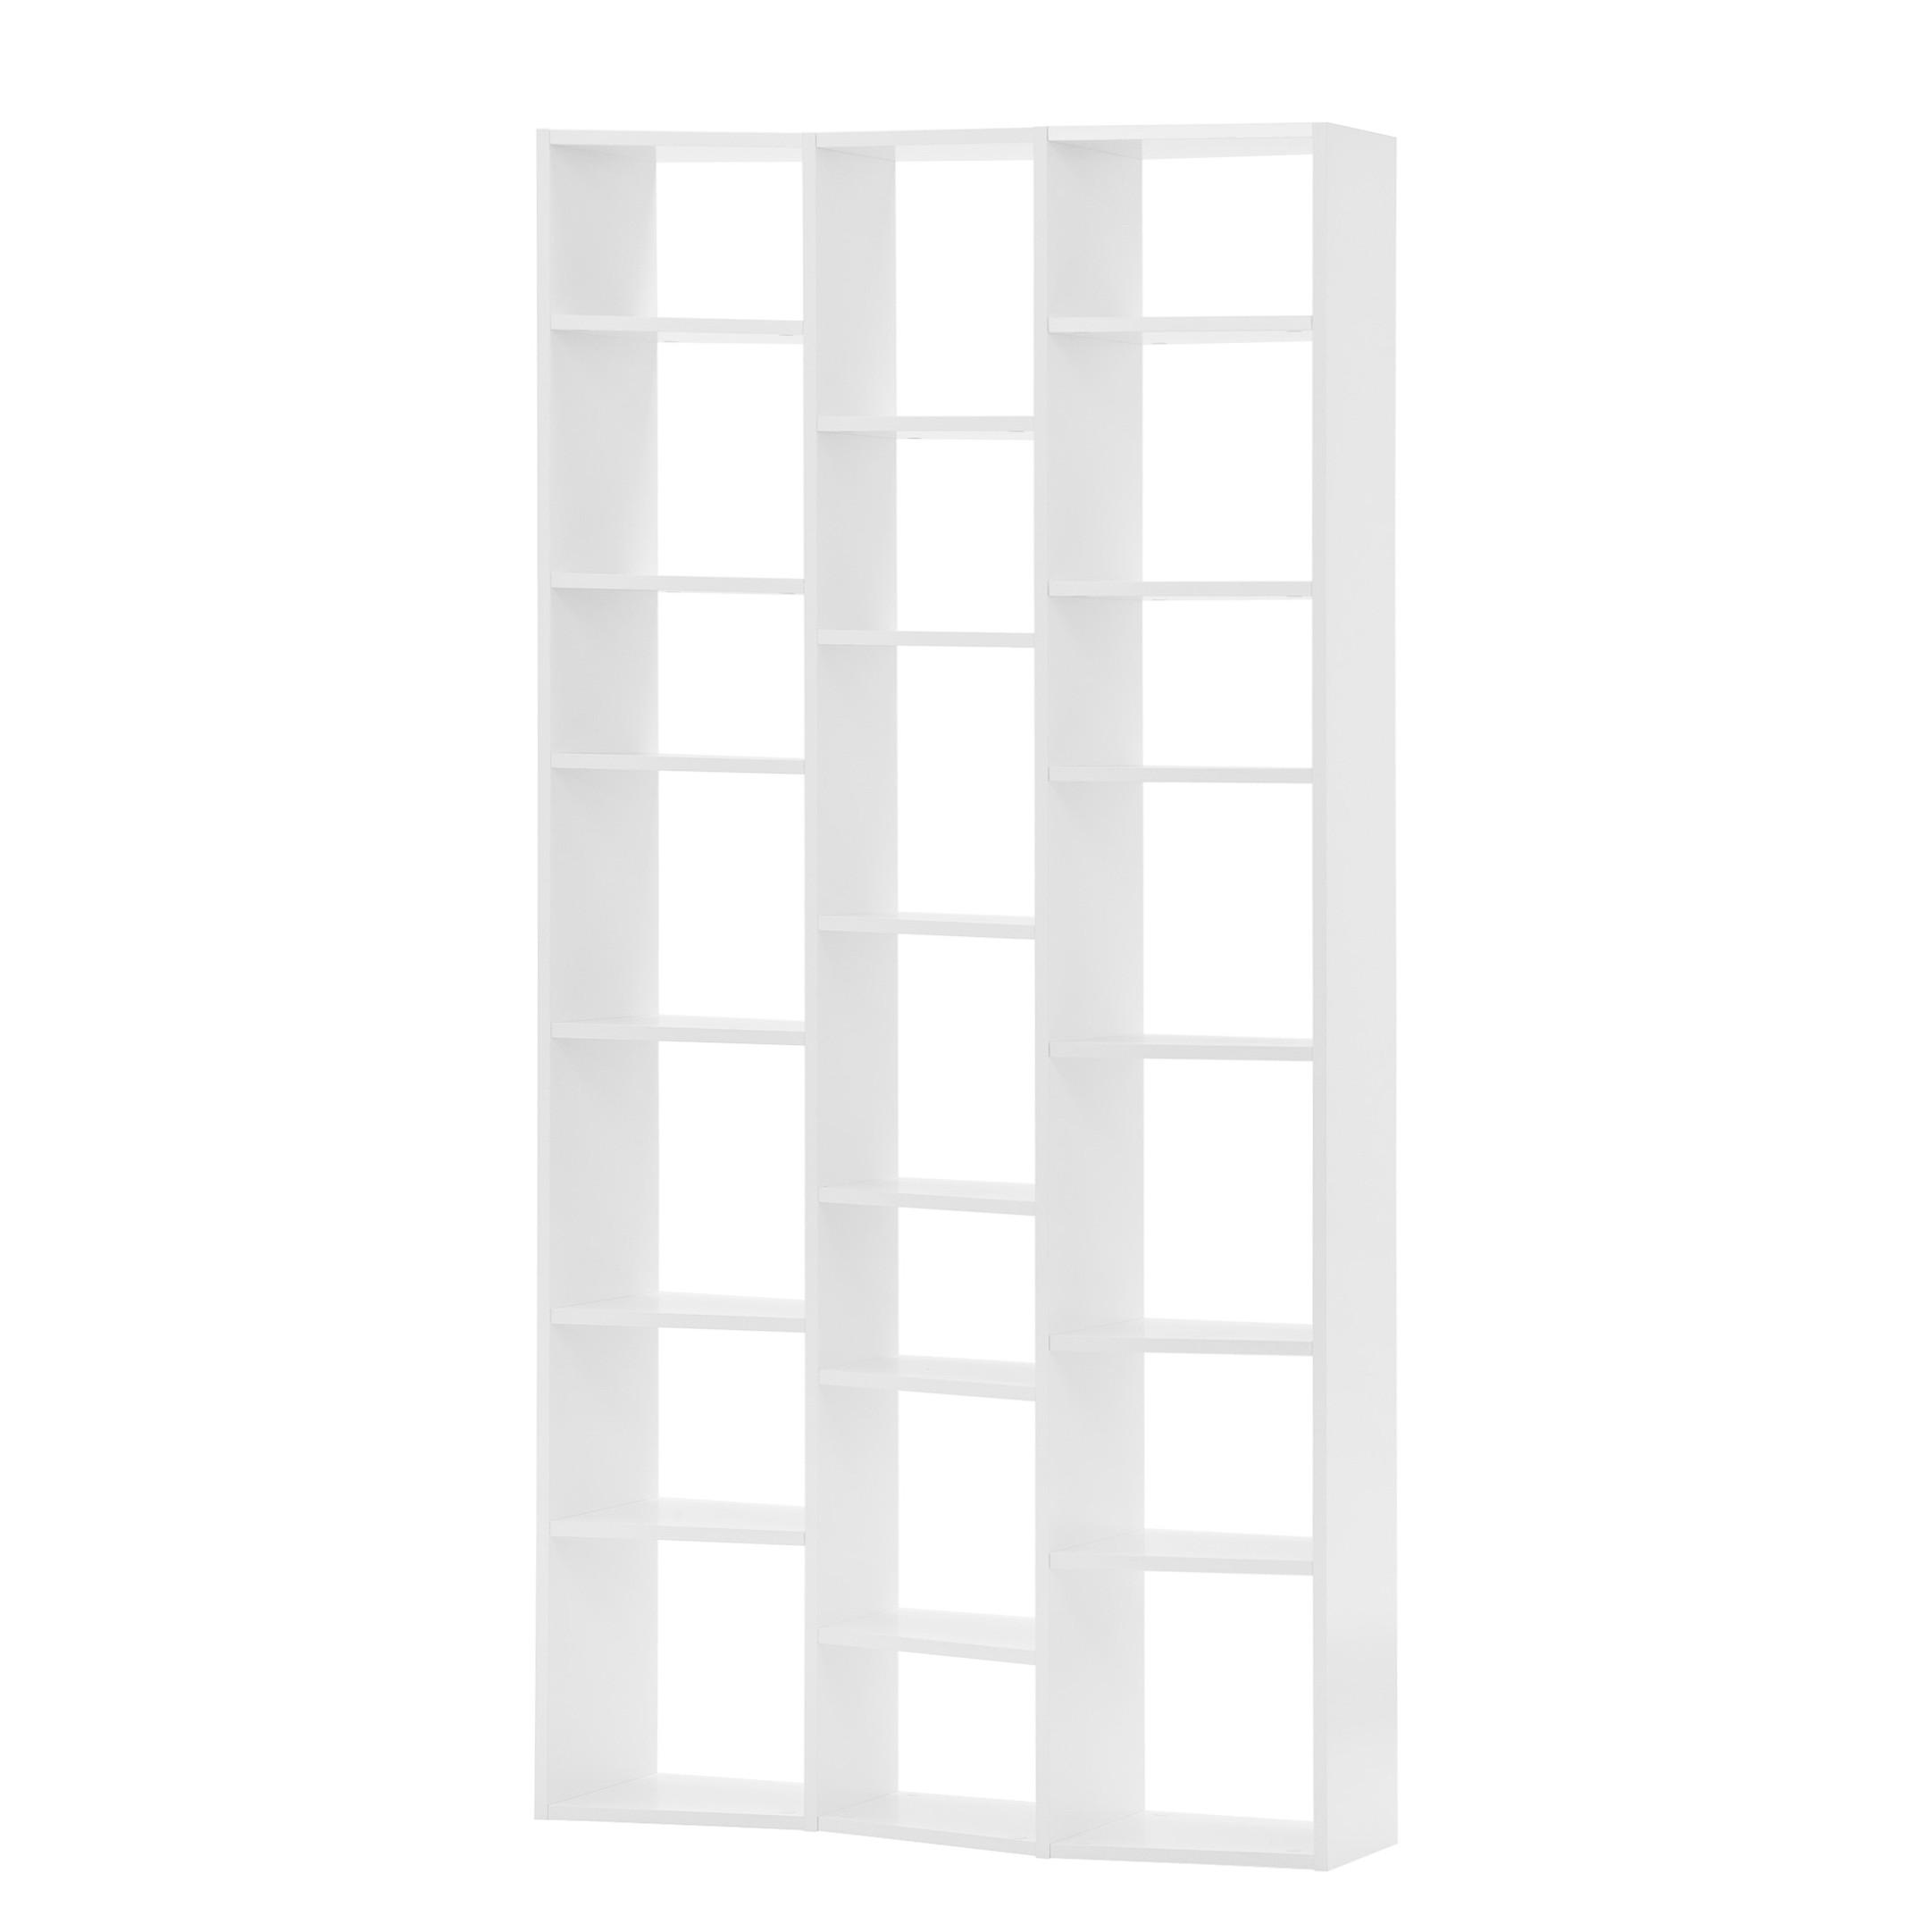 Regal Maze IV, loftscape